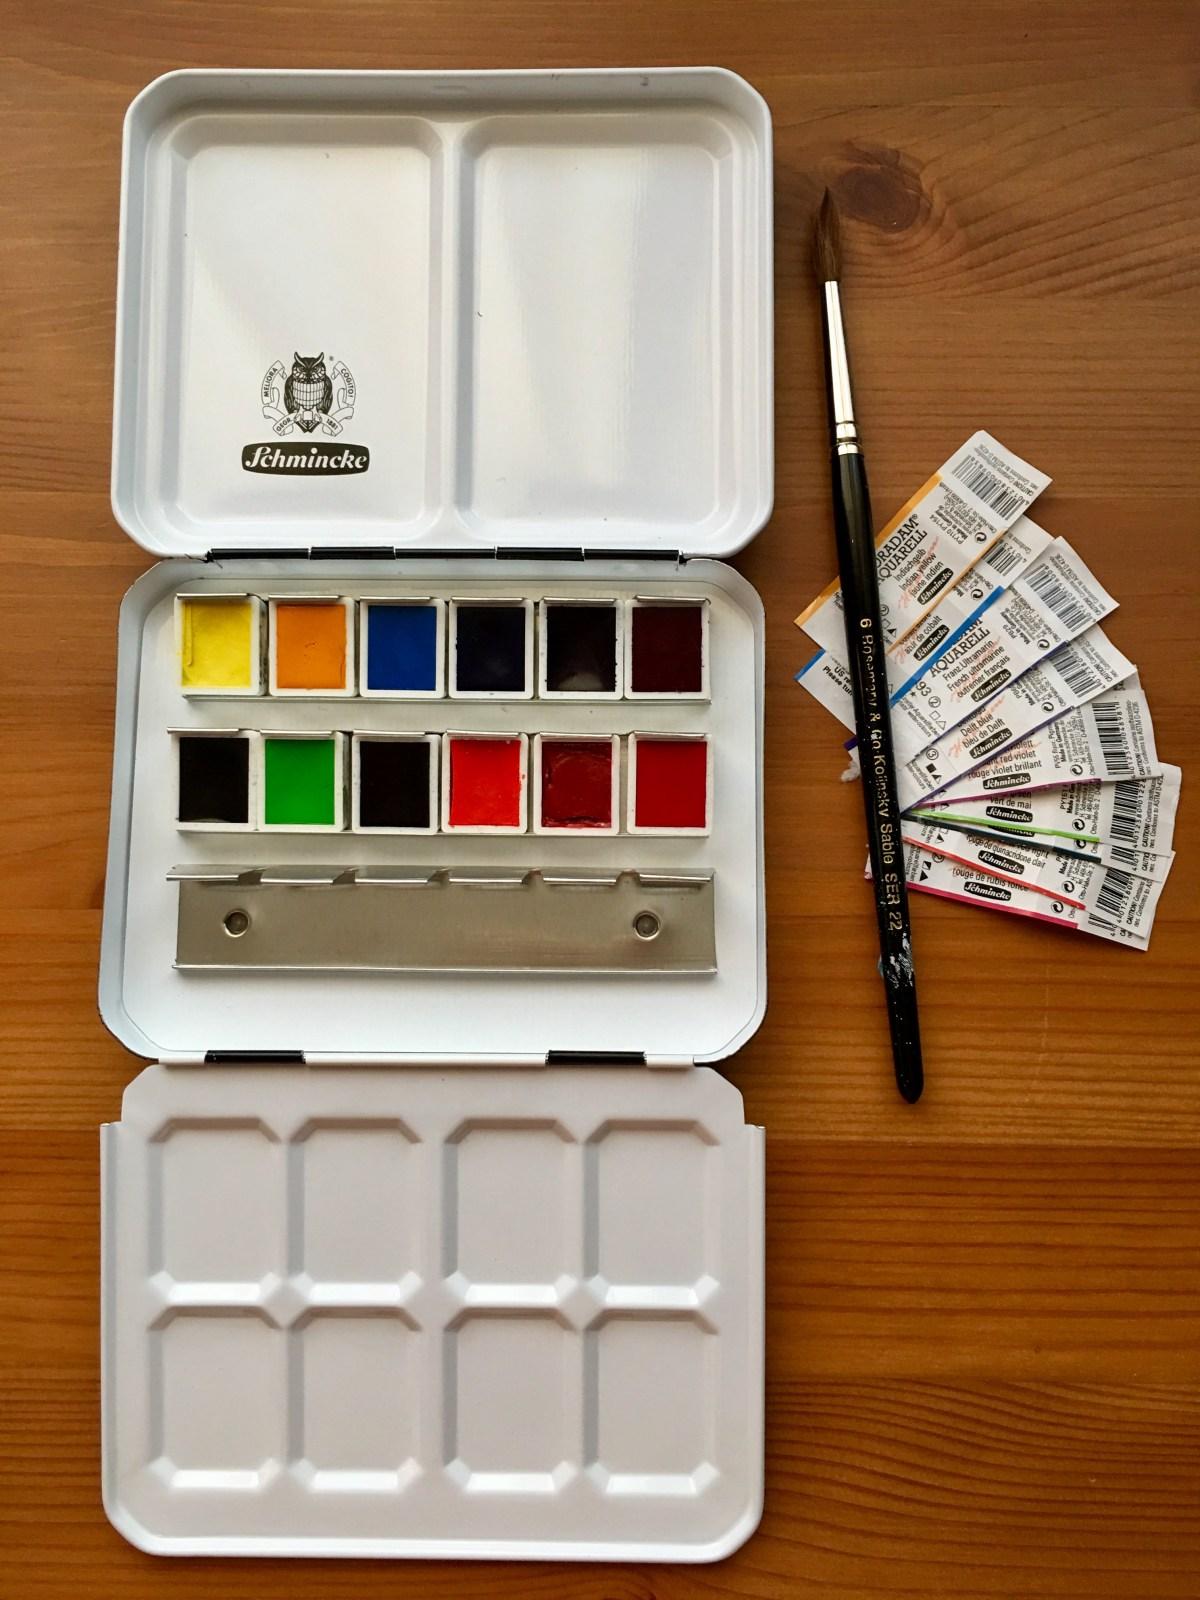 Schmincke Marilyn A. Garber 2017 Custom Set from Wet Paint & Schmincke 125 anniversary New Colors swatch